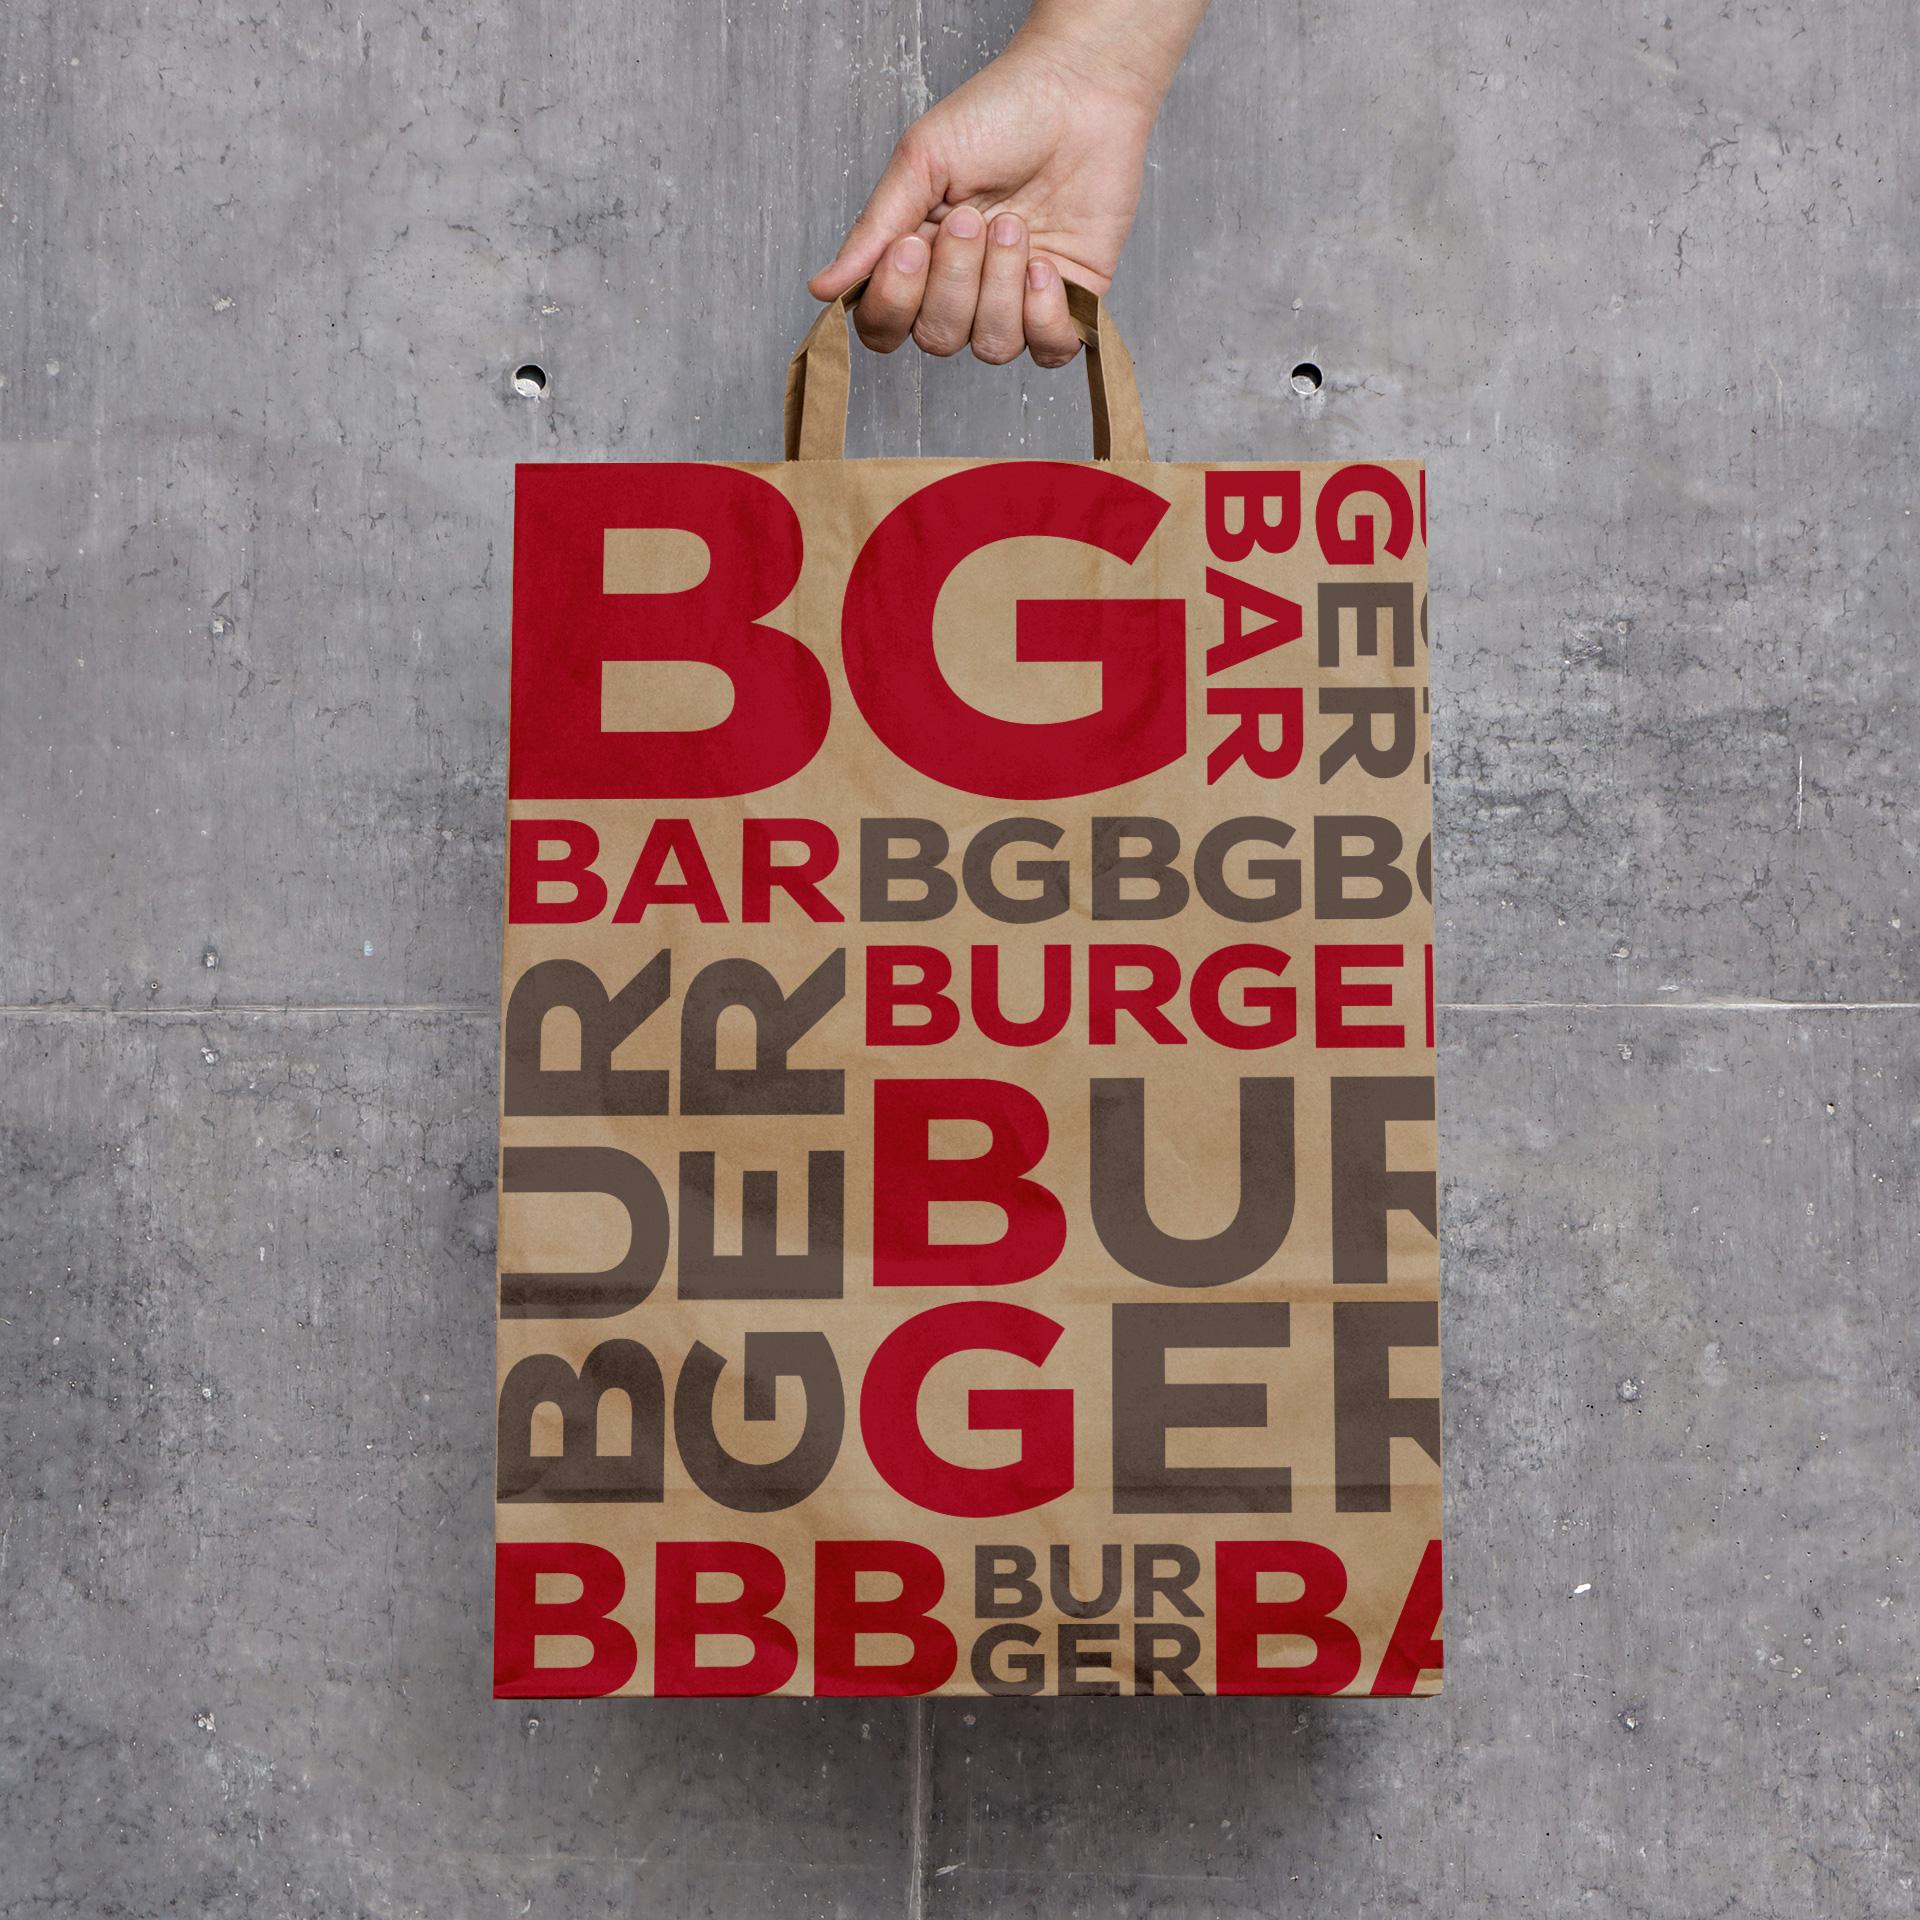 Dizajn kese za restoran BG Burger Bar, Beograd